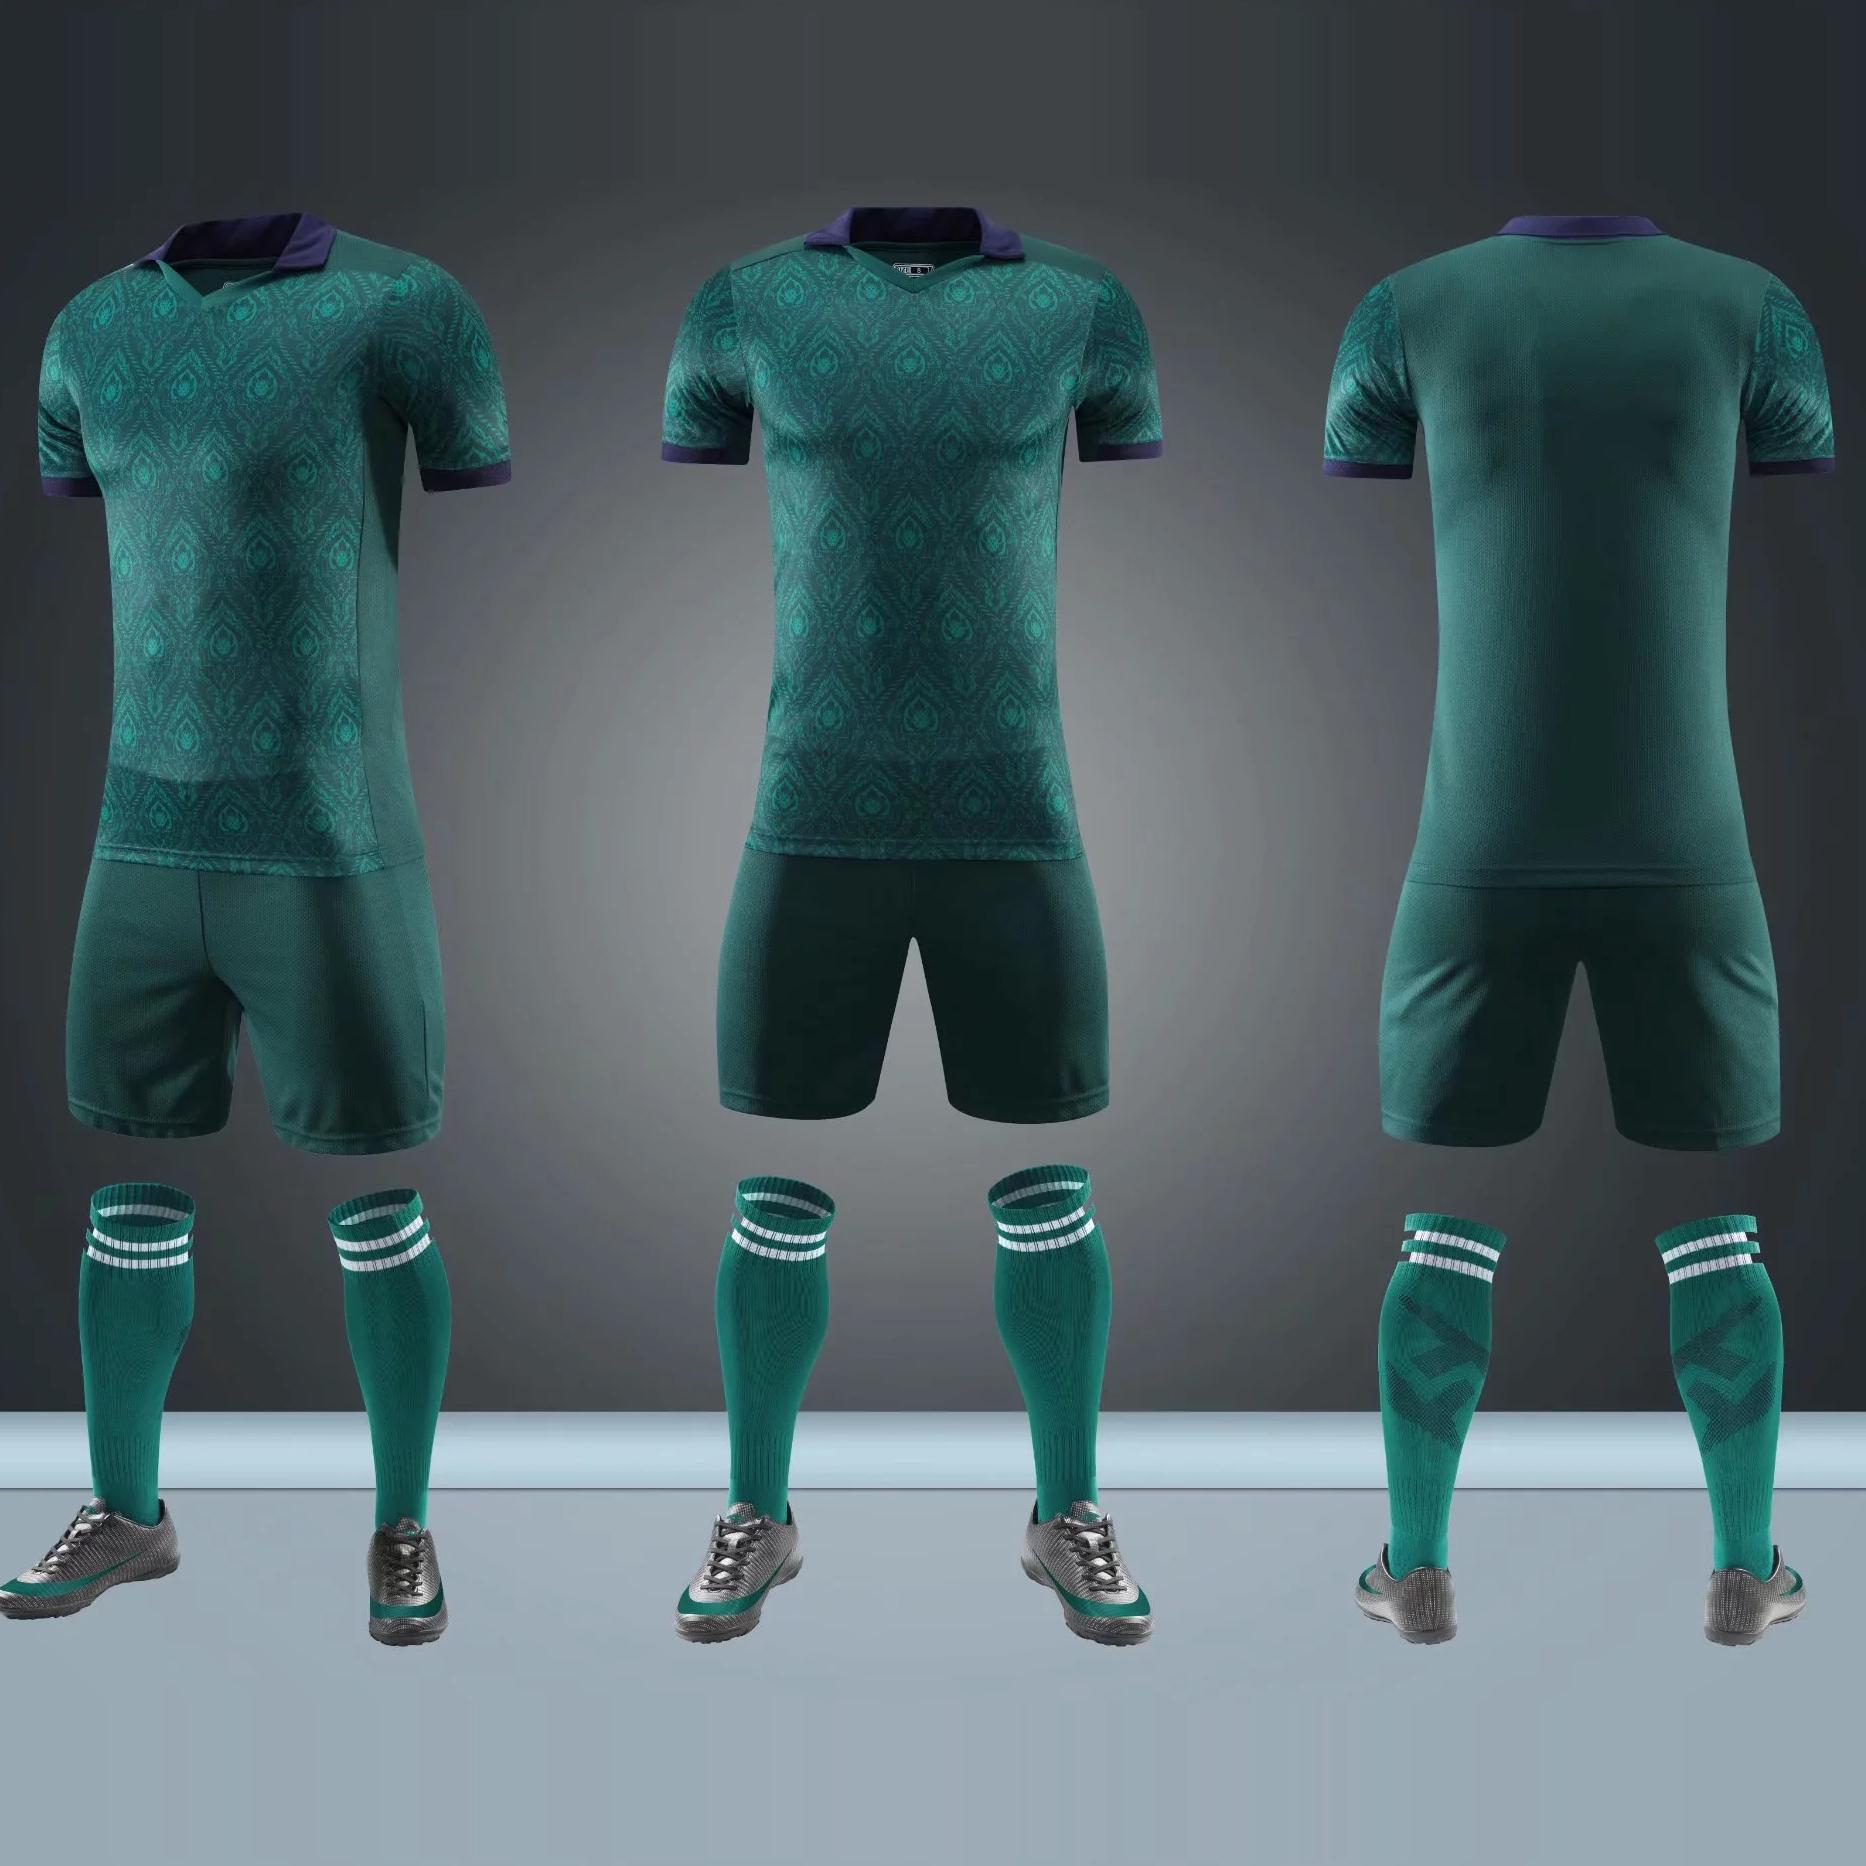 2020 Kids Adult Buffon Soccer Uniforms Personality Customized Football Jerseys Italy National Teams Fans Soccer Suit Free Socks